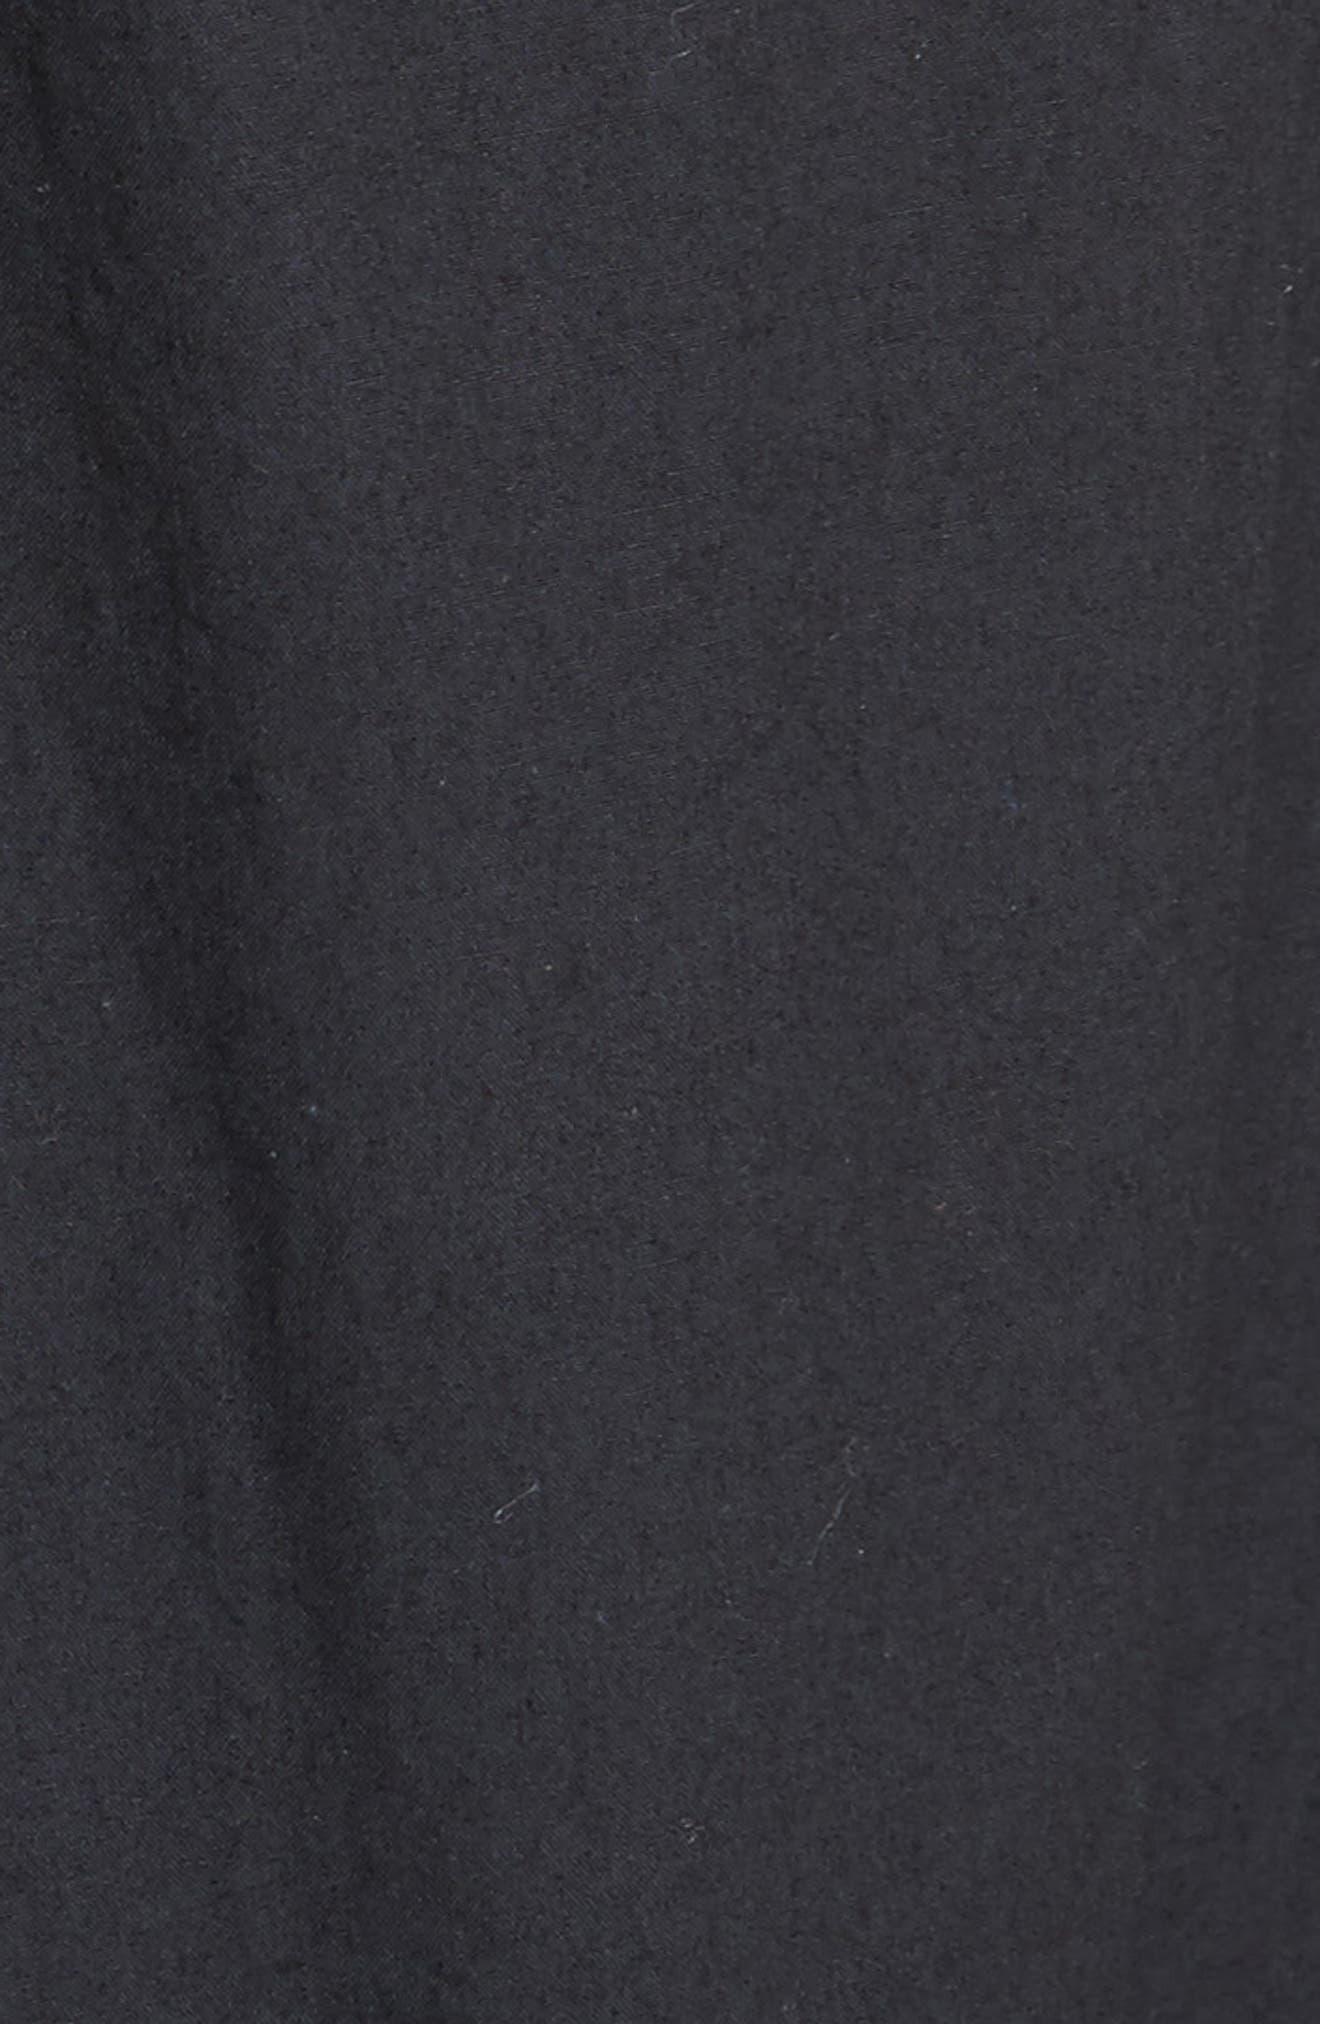 Clorinda Tie Front Cutout Cotton Dress,                             Alternate thumbnail 6, color,                             Caviar